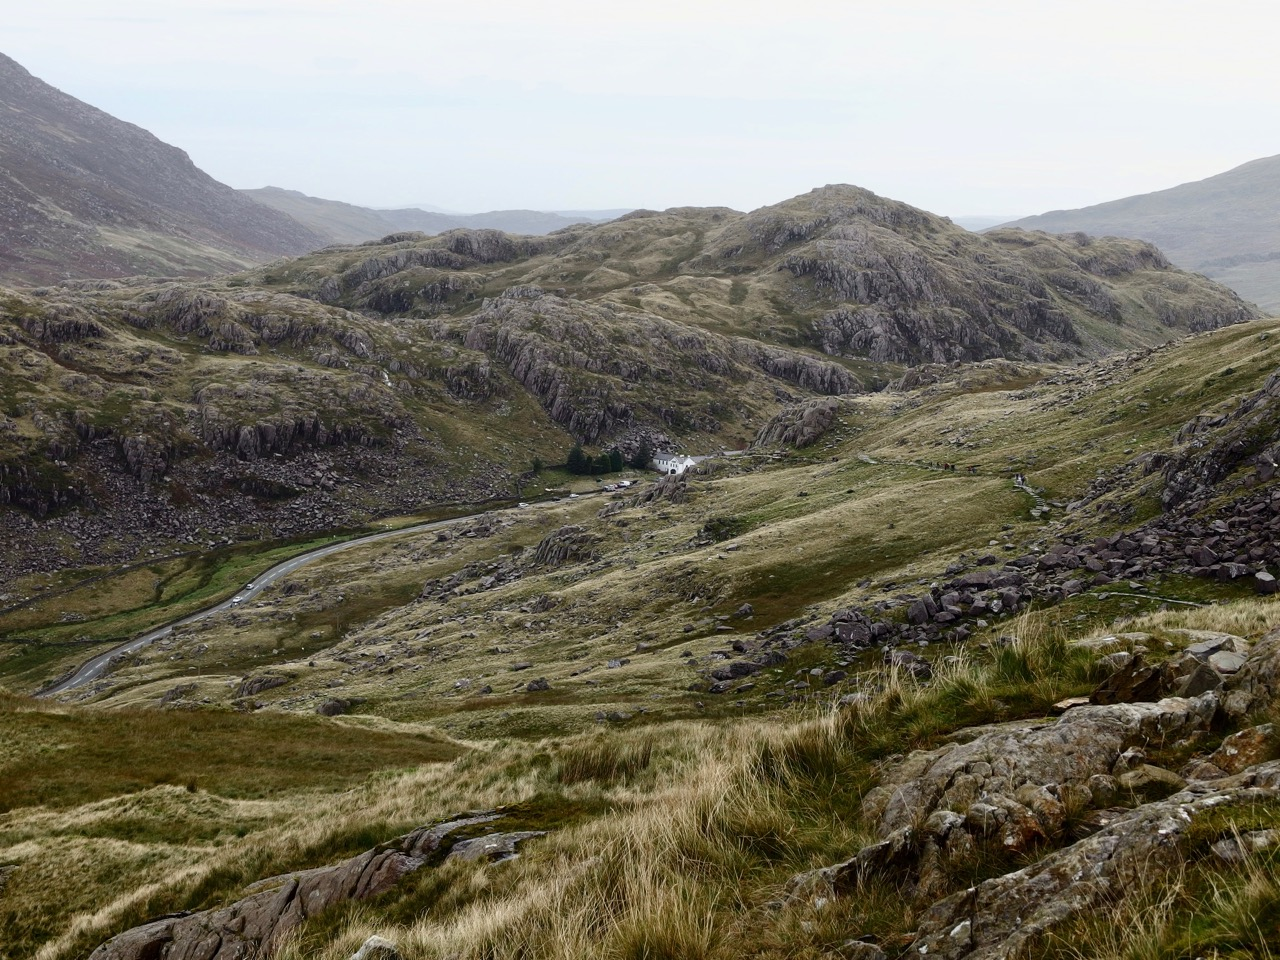 Hike, Mount Snowdon, Wales